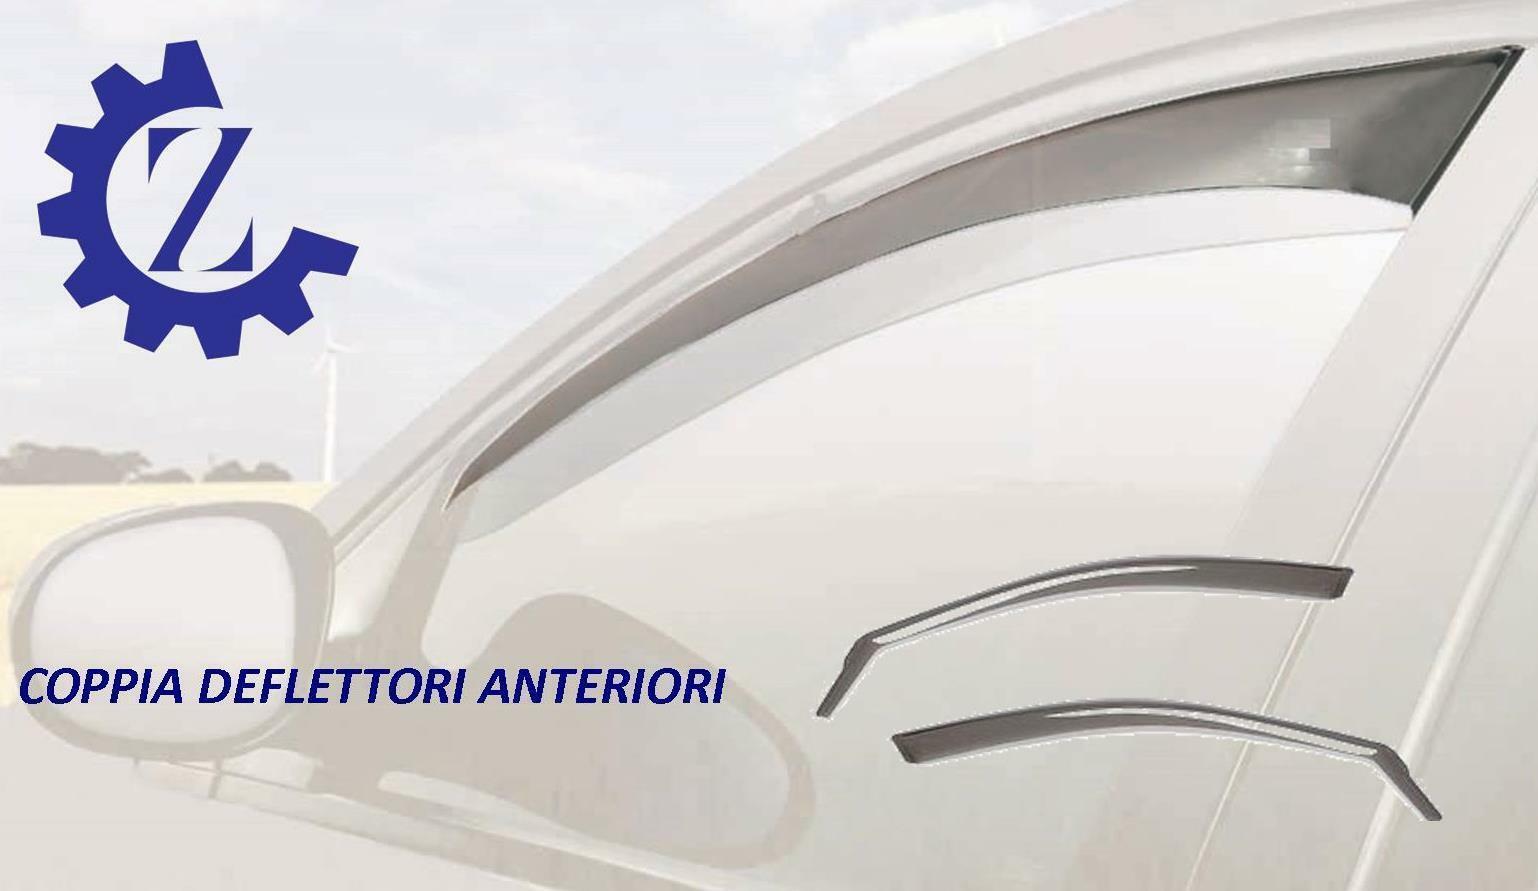 DEFLETTORI ARIA ANTITURBO PER TOYOTA YARIS 99 06 5 PORTE